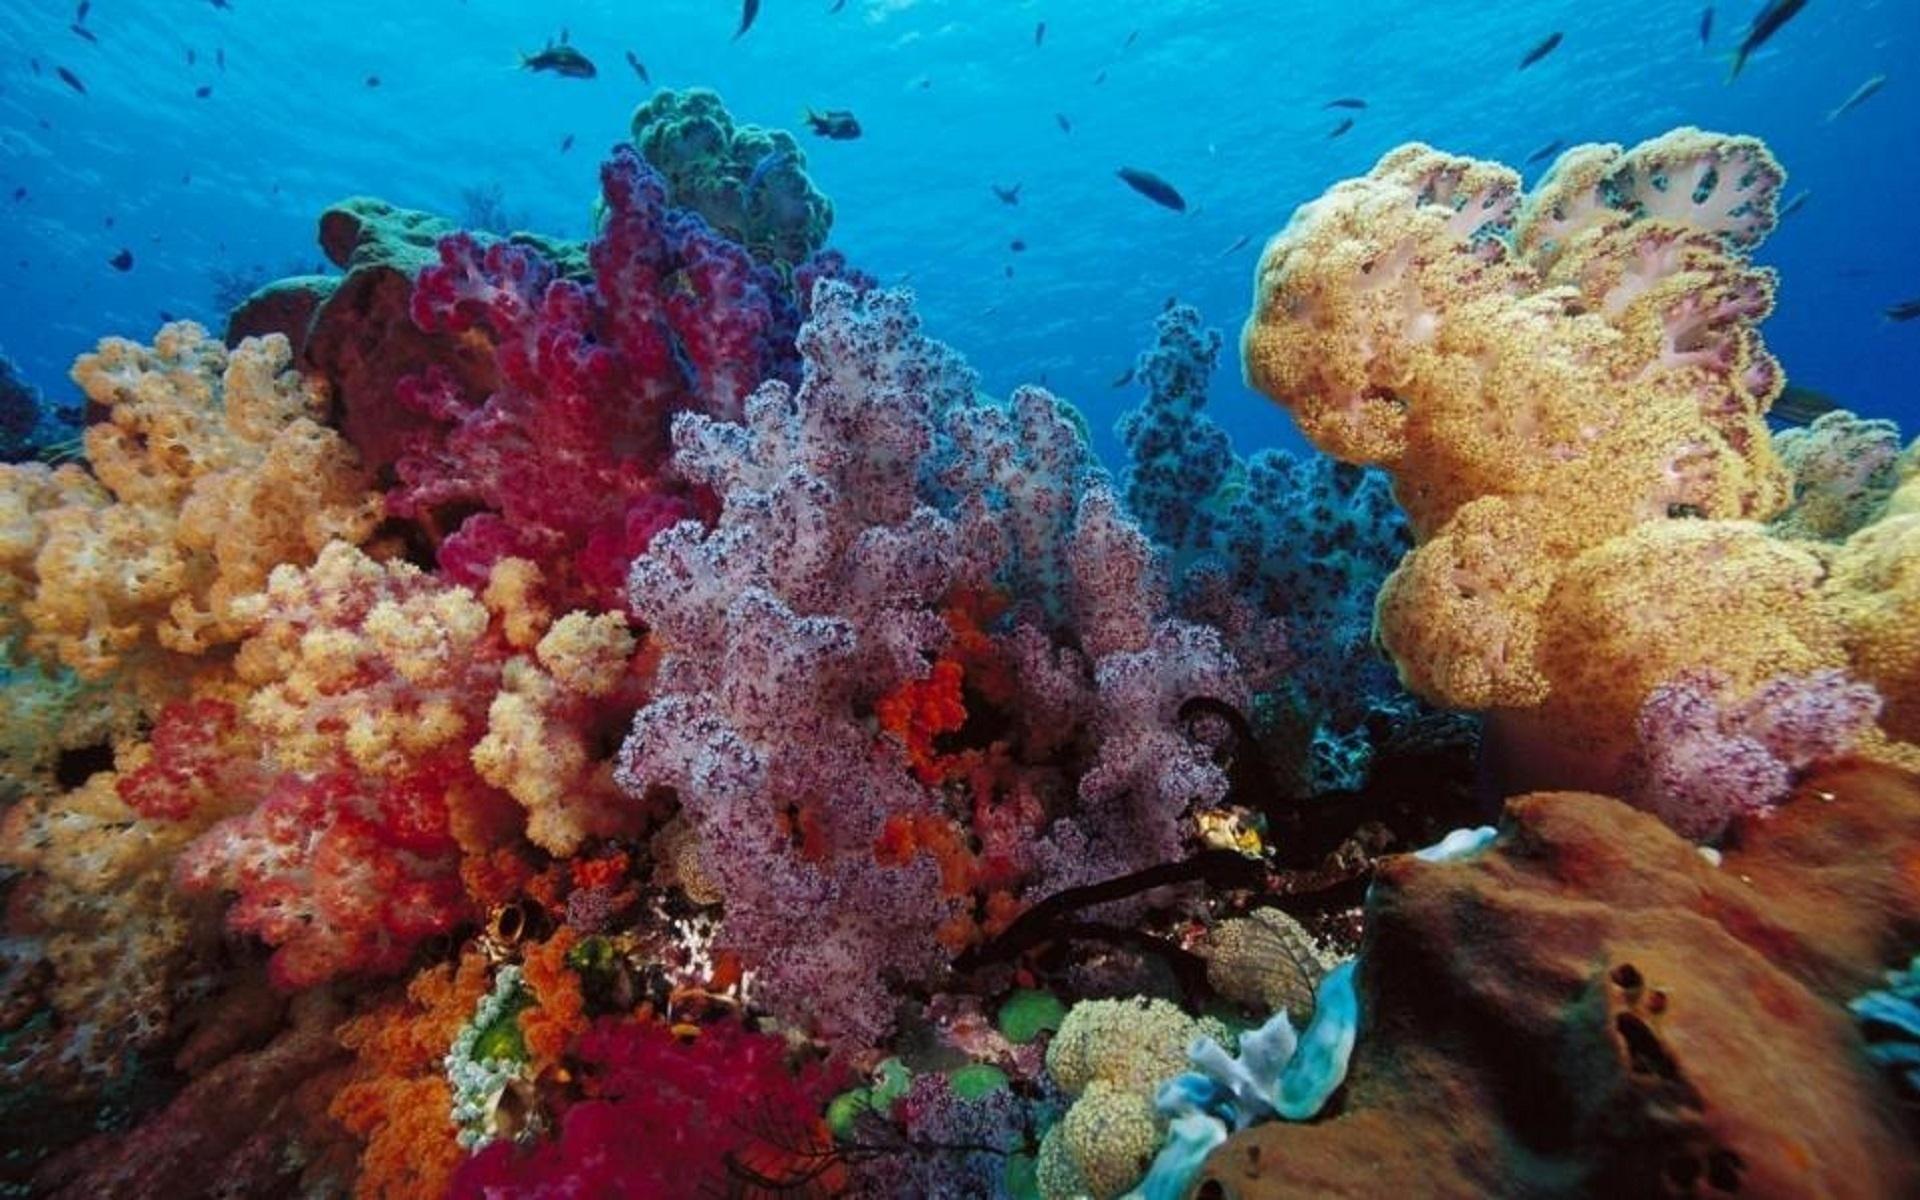 Картинки морской мир на рабочий стол, картинки